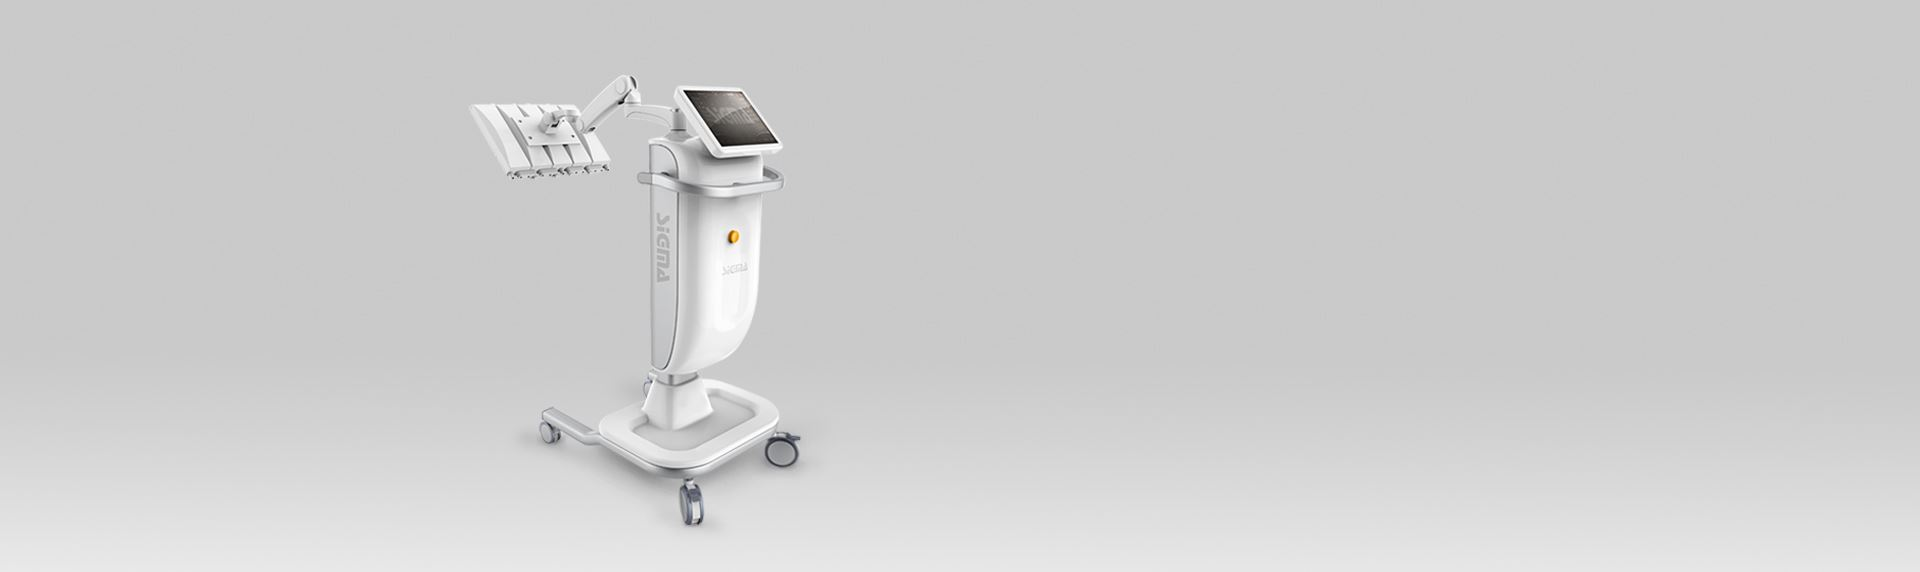 SSC设计-紫外线光疗仪器